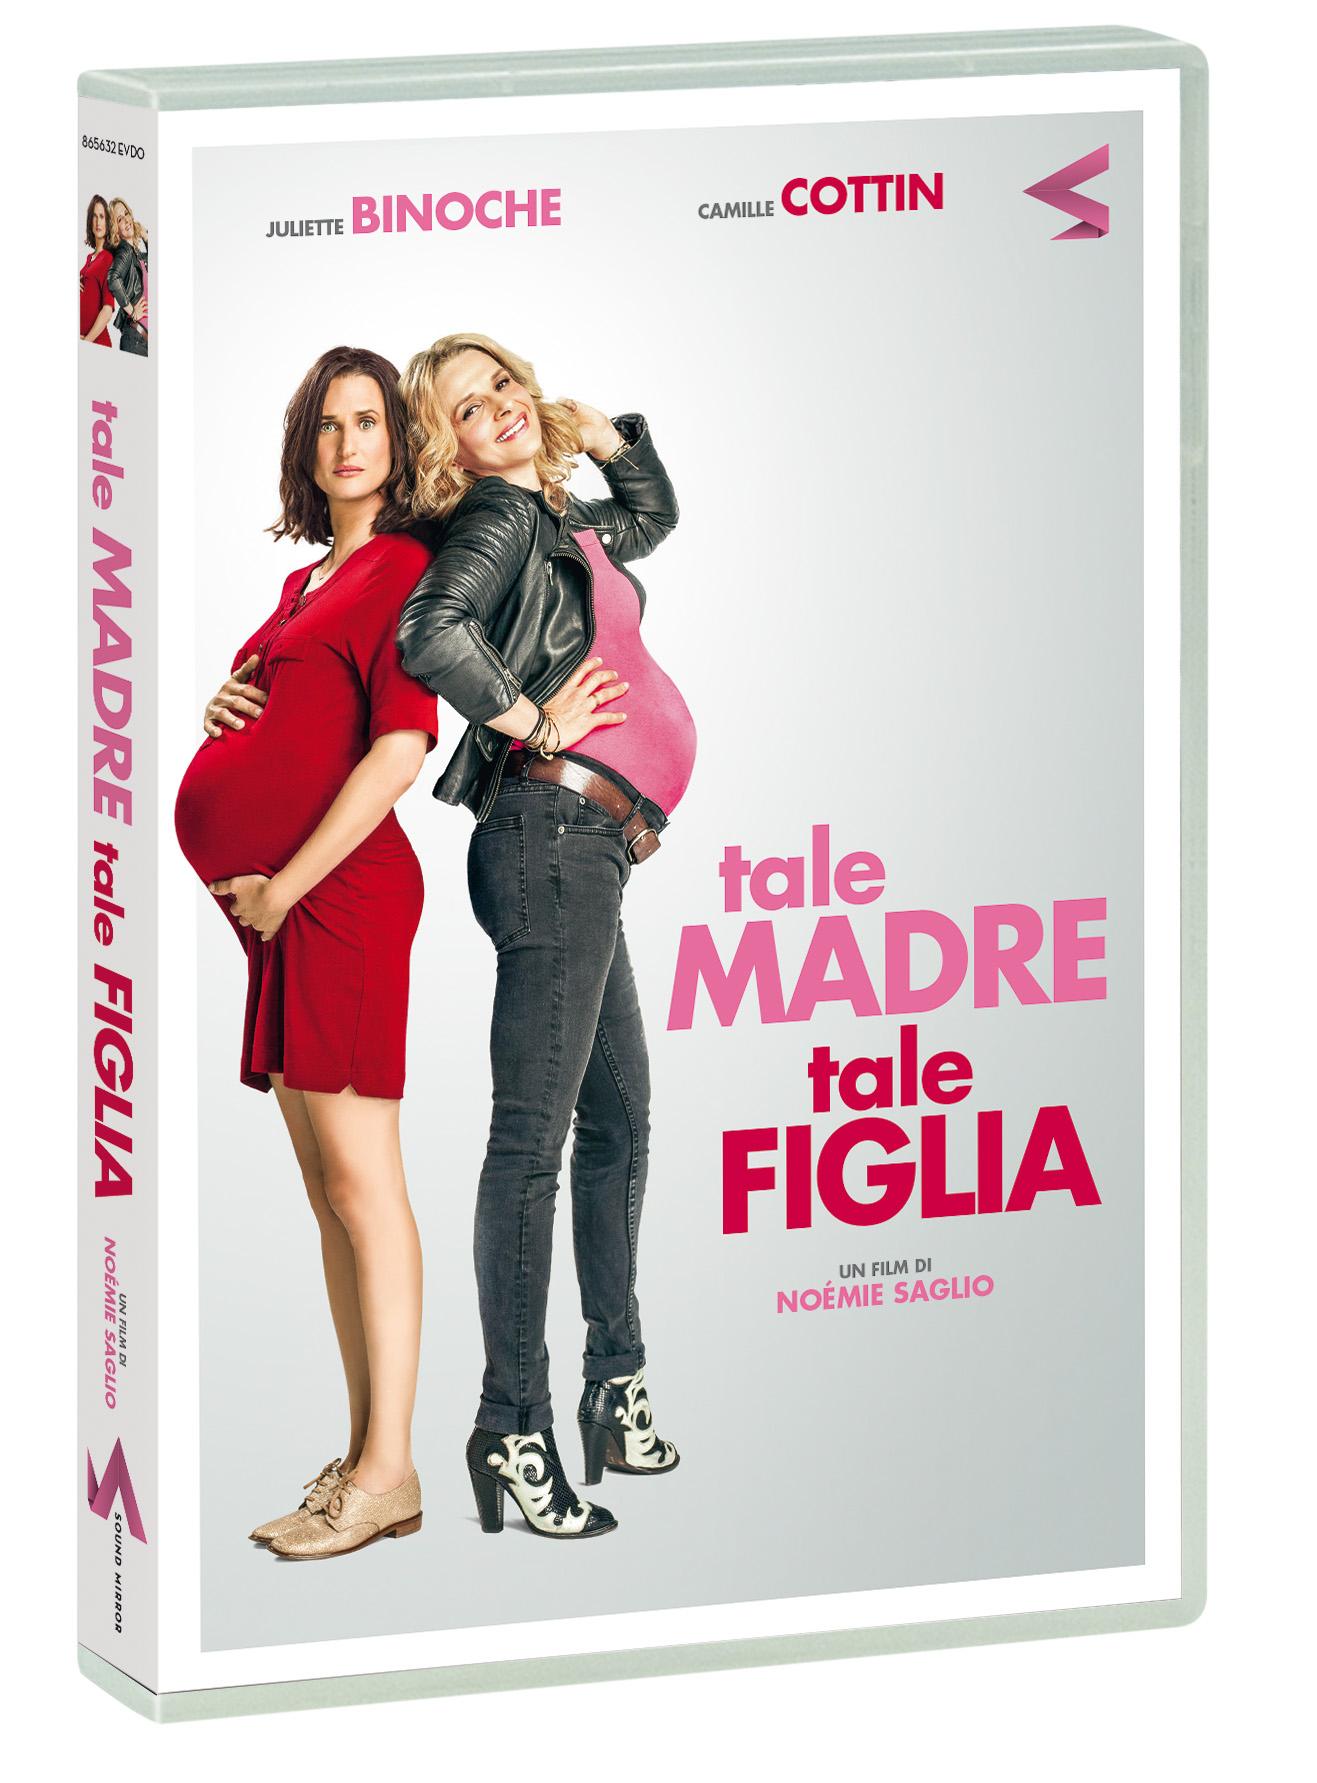 TALE MADRE TALE FIGLIA (DVD)